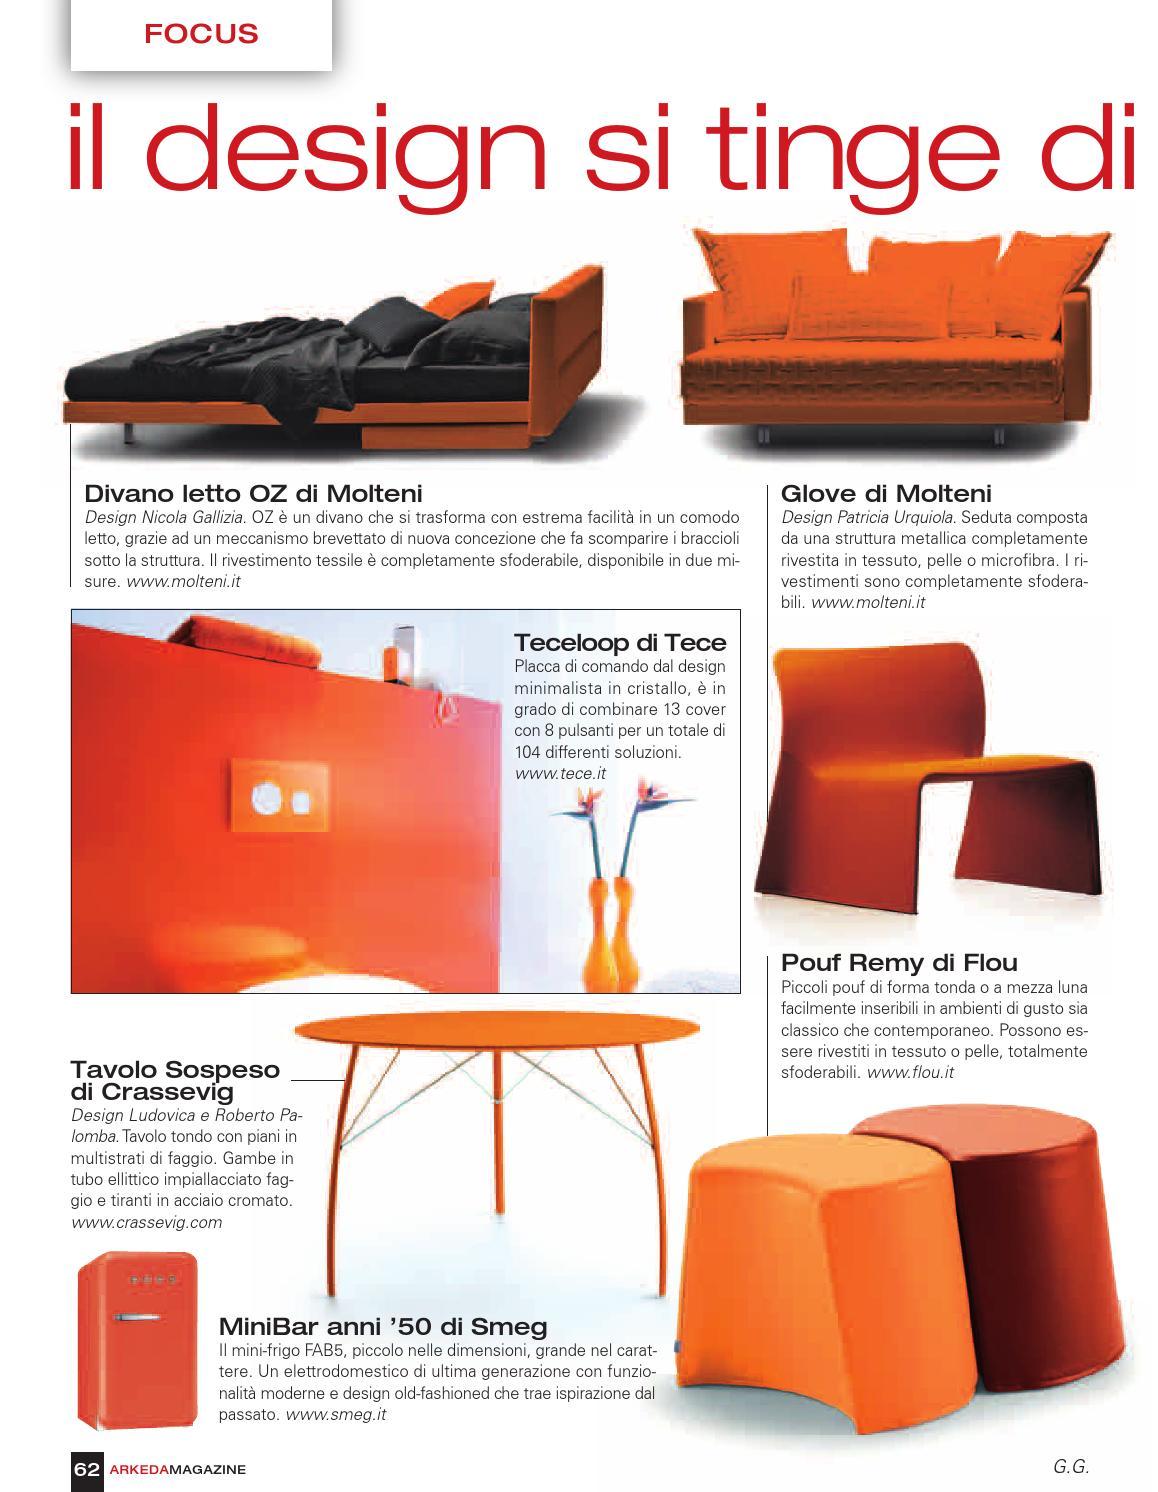 Frigo Smeg Anni 50 Piccolo arkedamagazine 02 by estensa - issuu